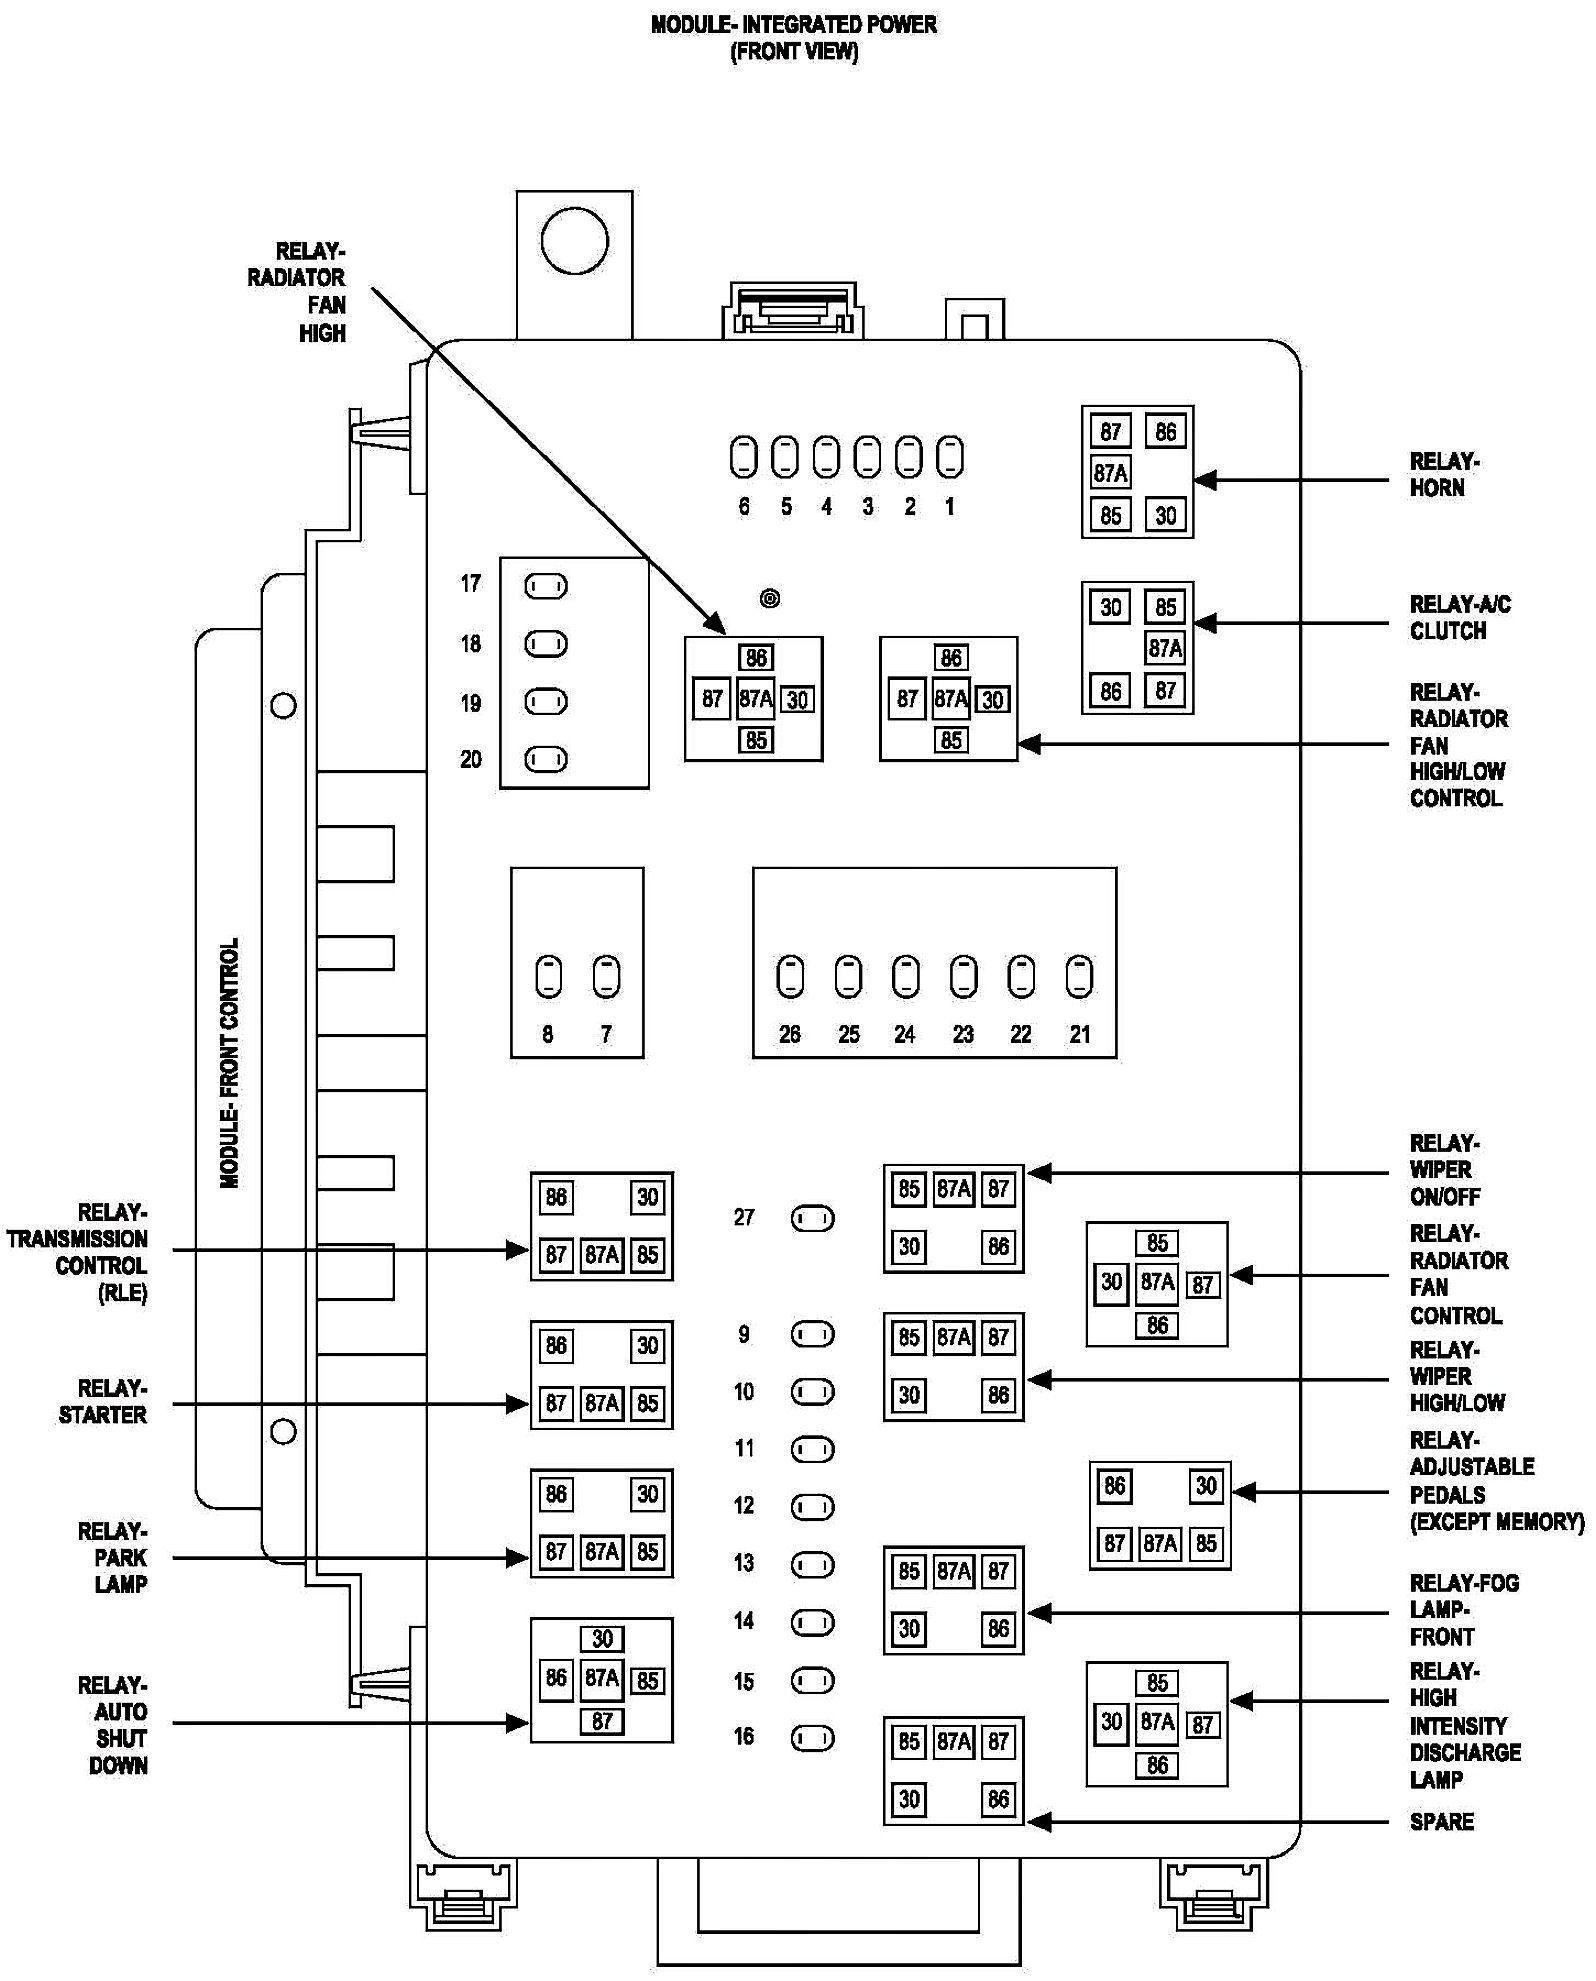 Stewmac Wiring Diagrams: Wiring Diagram Bass Guitar Valid Stewmac Wiring Diagrams To Elegant rh:pinterest.com,Design